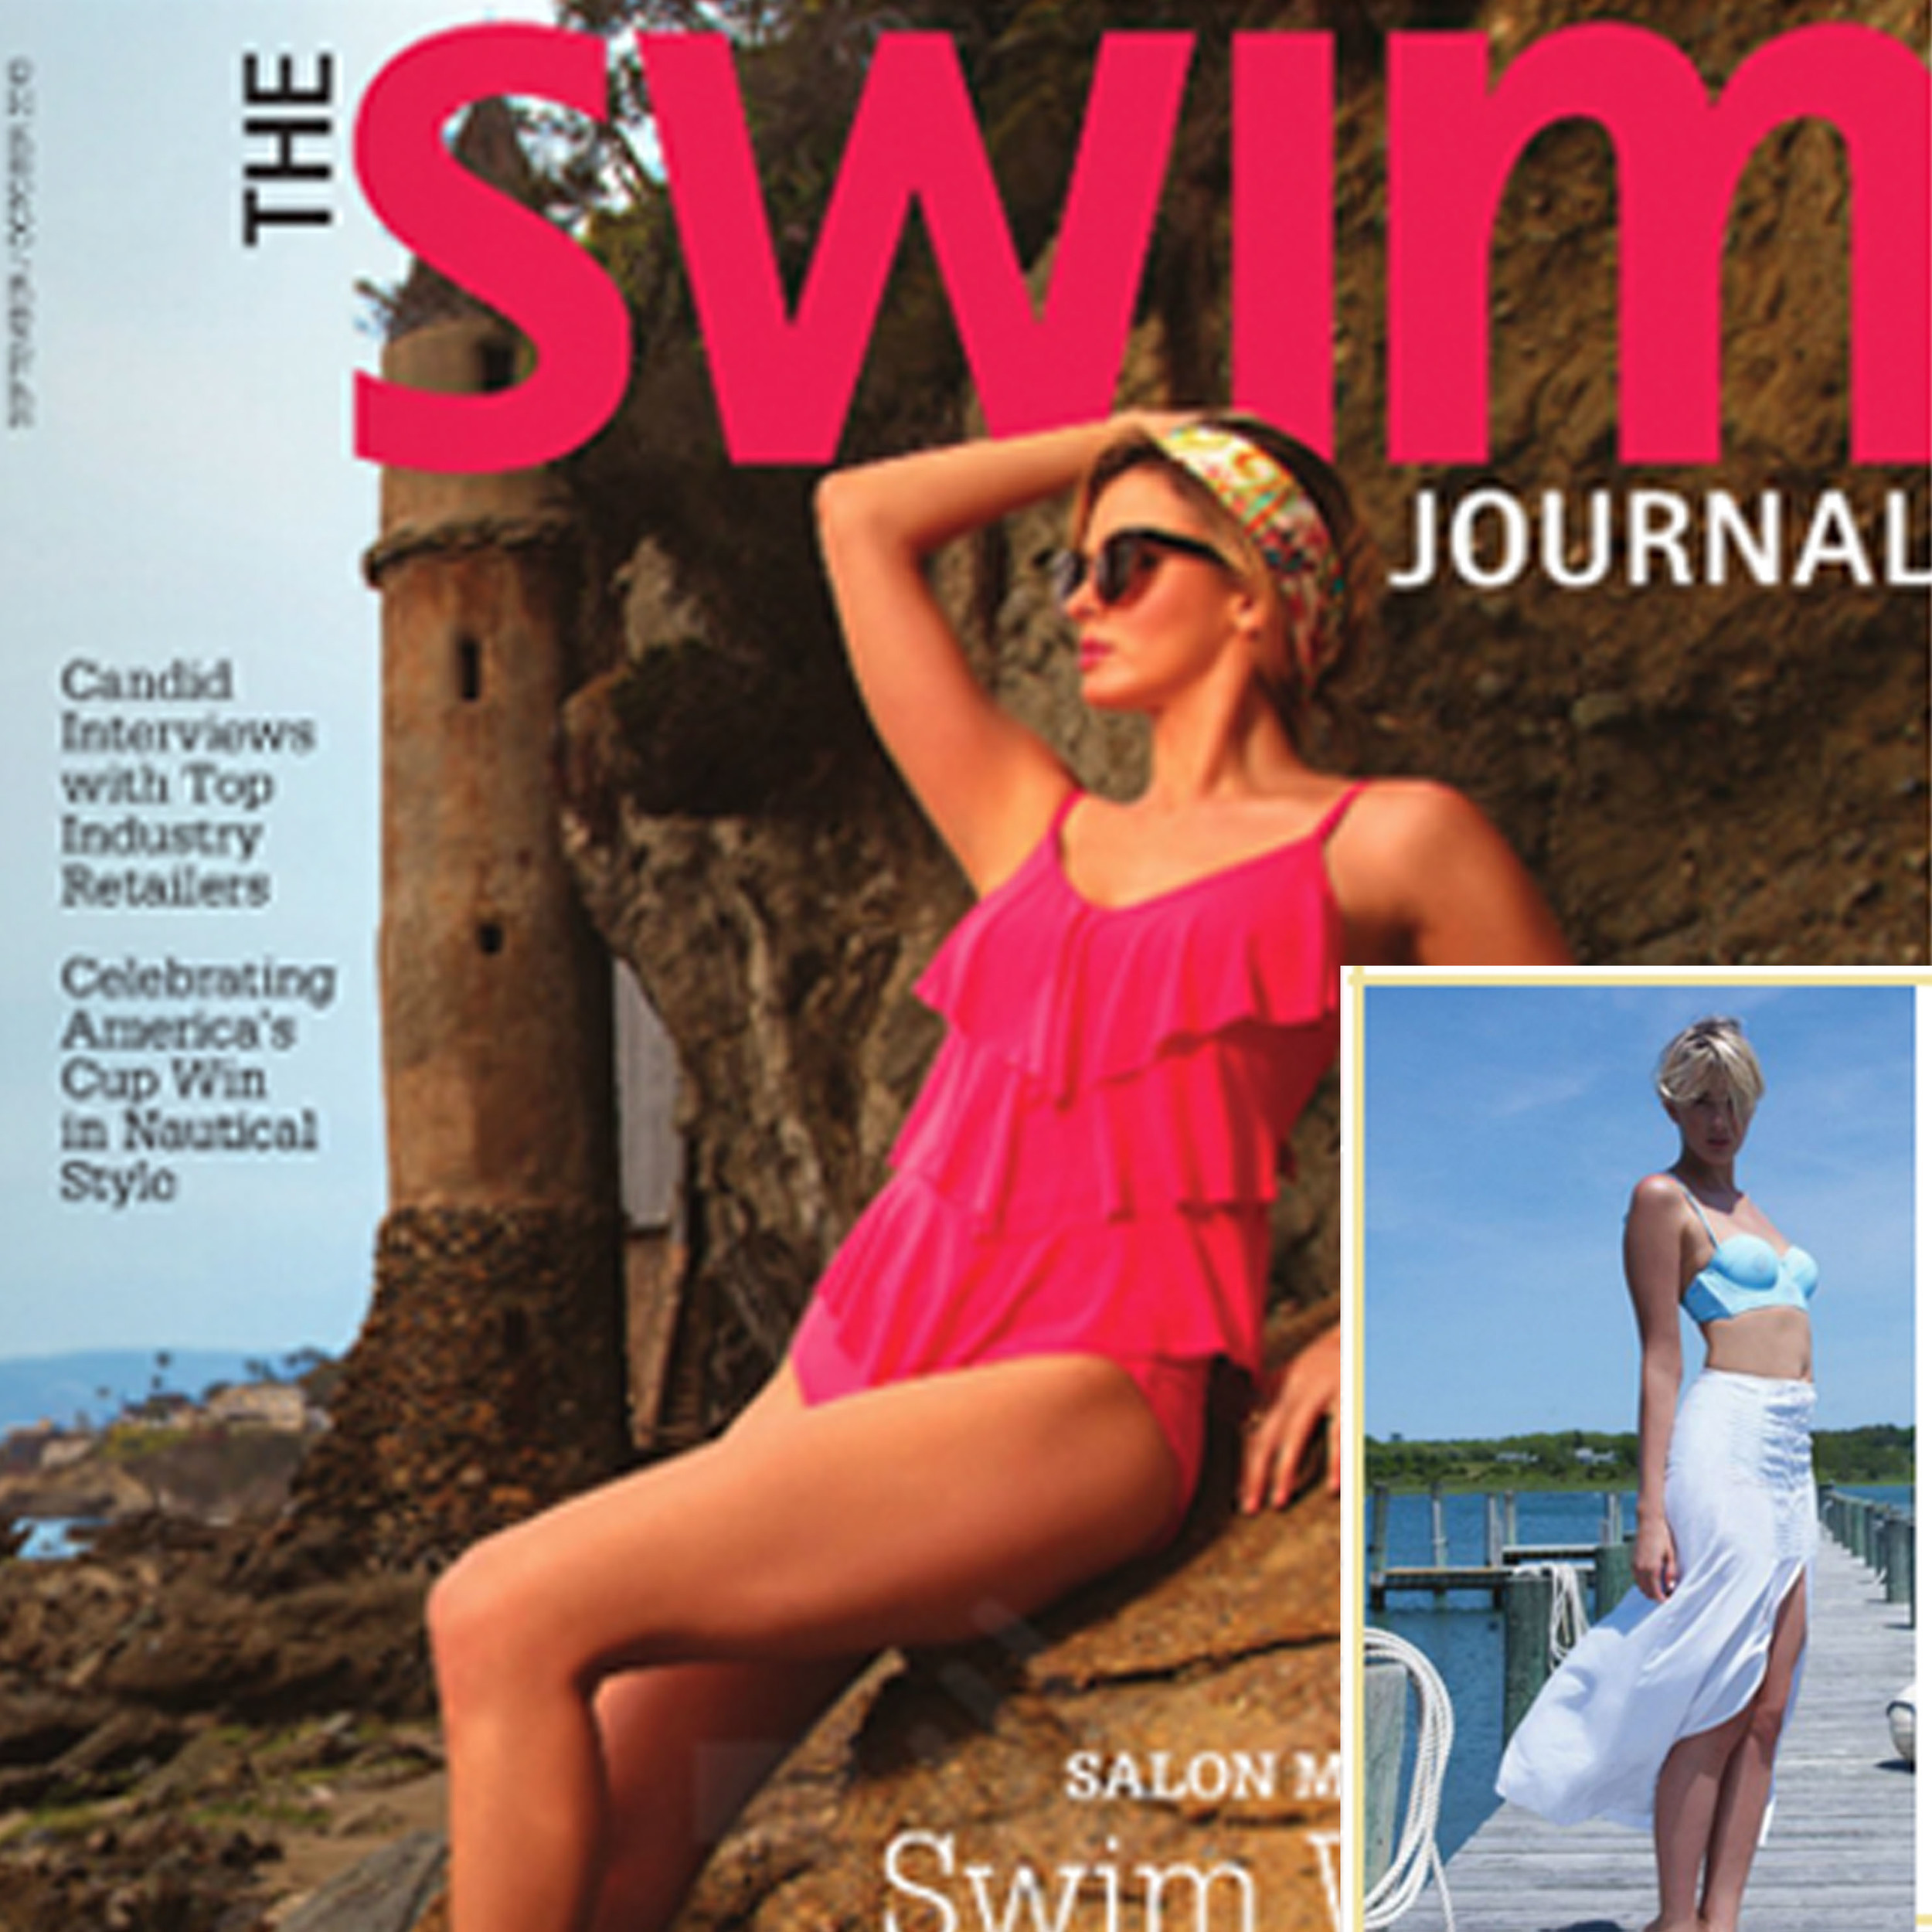 The Swim Journal